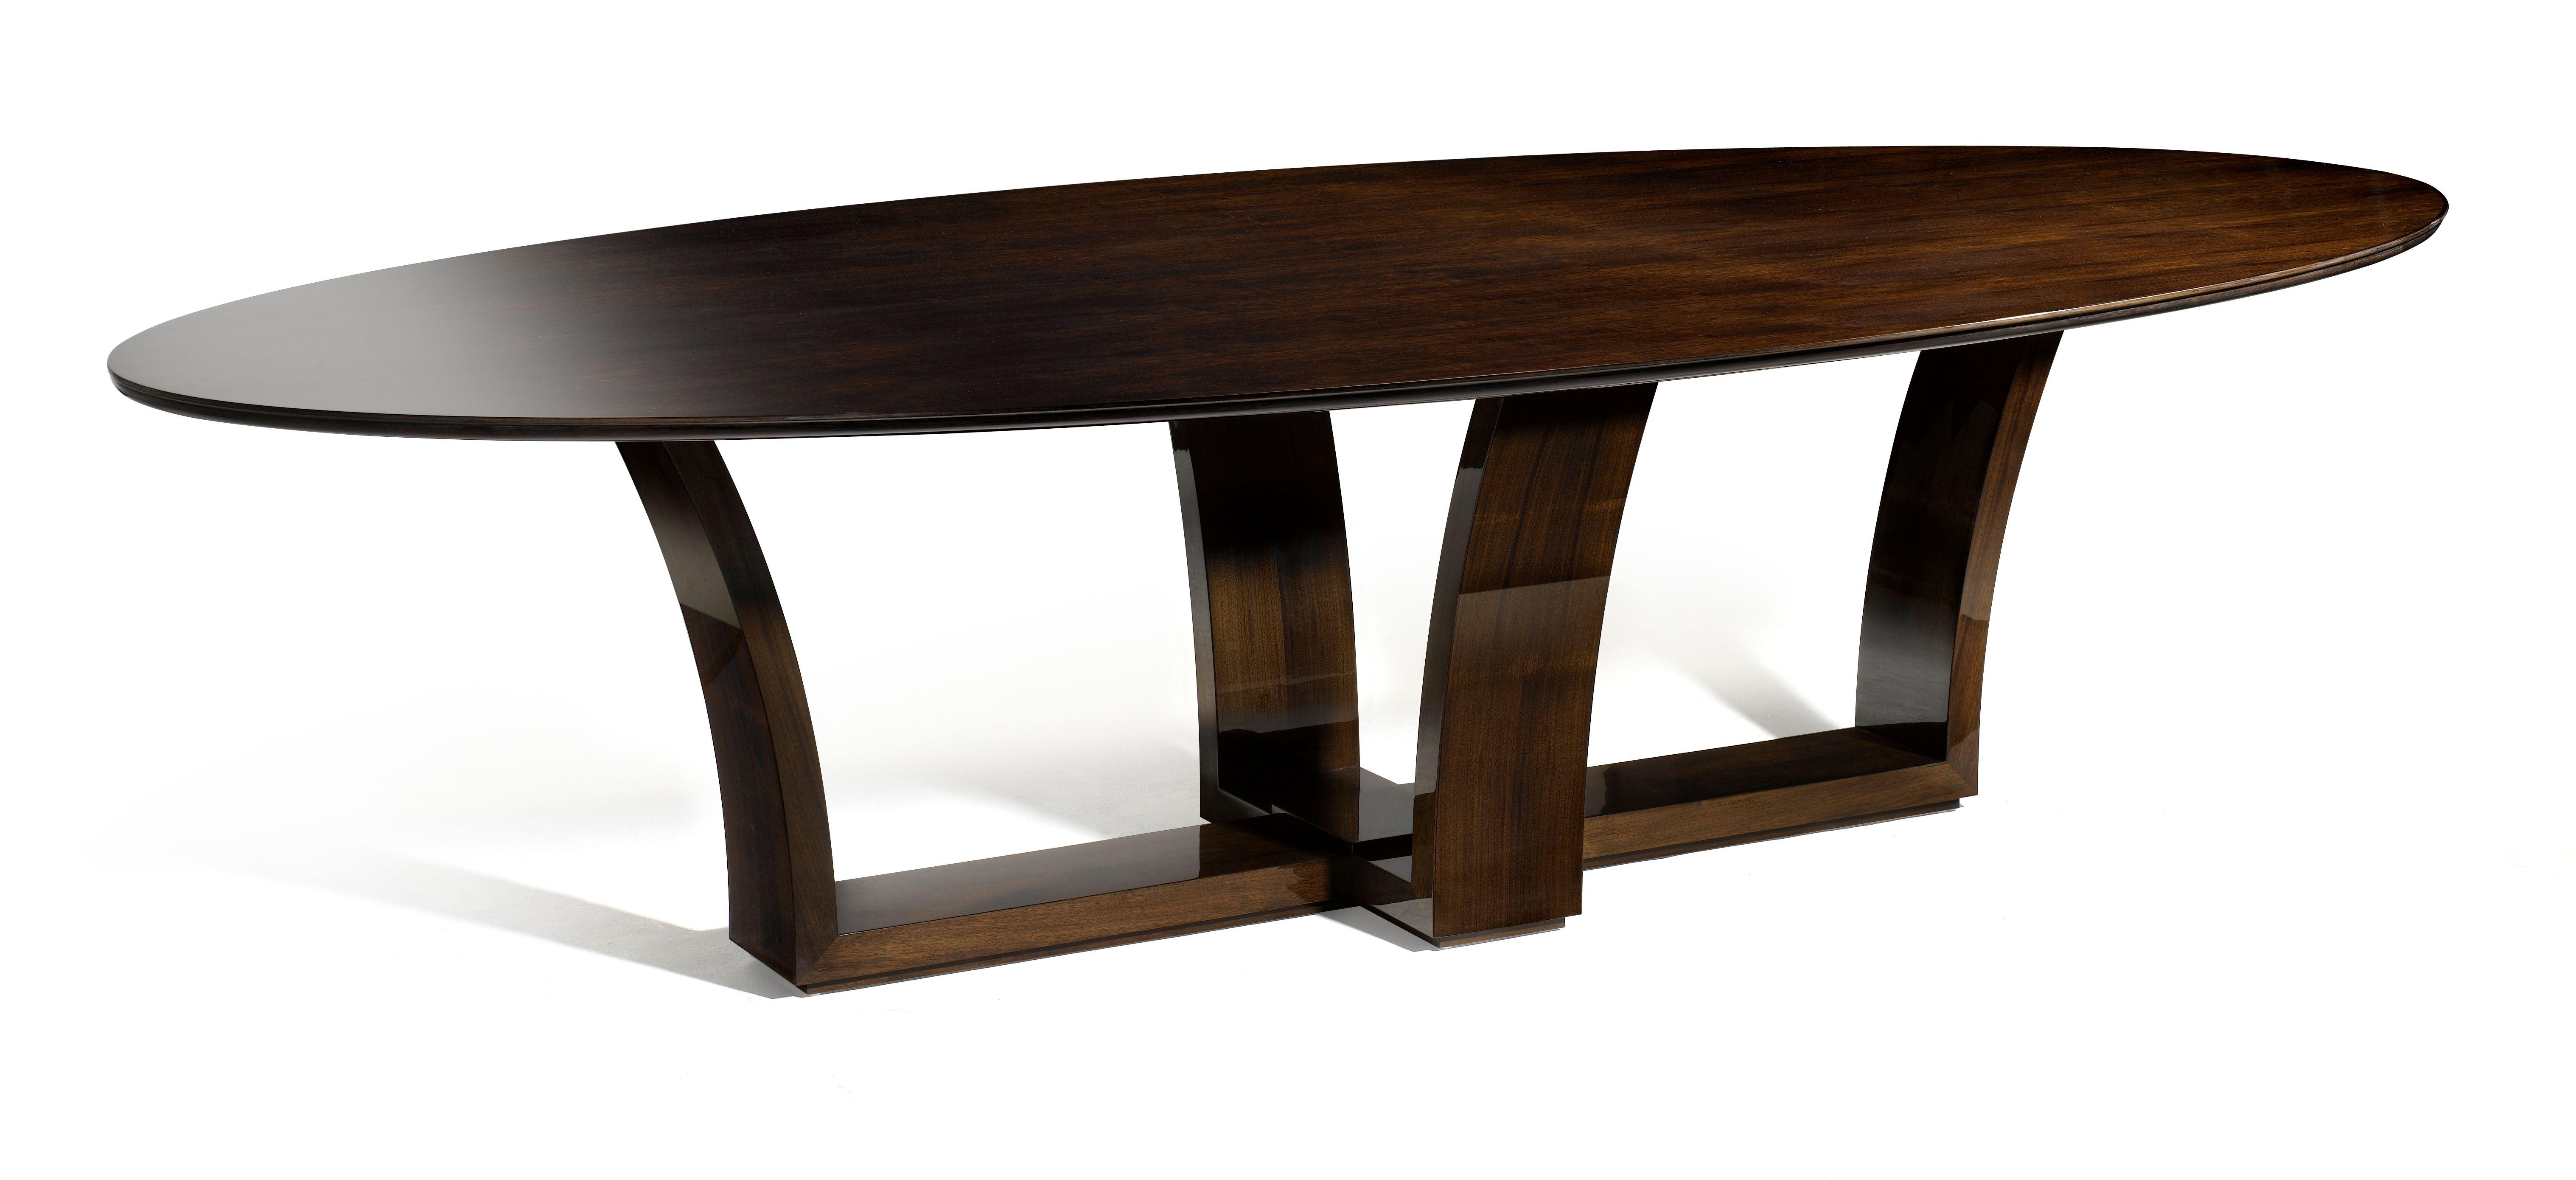 Davidson London The Lexington Table In Tinted Walnut Luxury